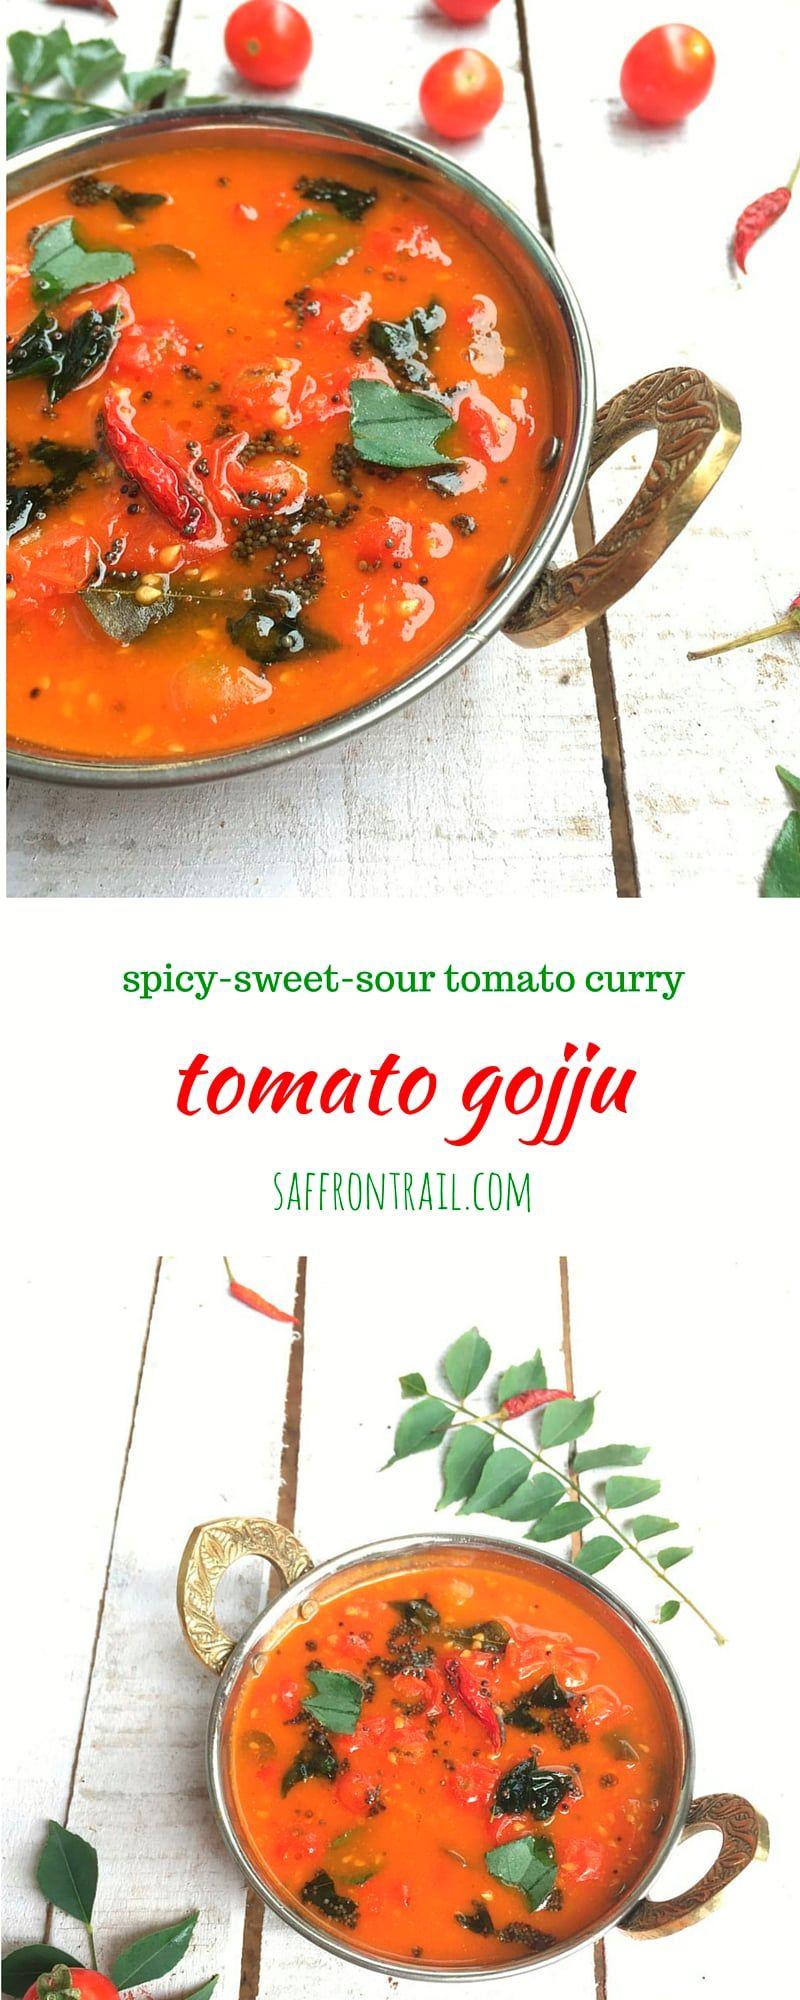 Tomato gojju a curry from karnataka recipe cherry tomatoes tomato gojju a curry from karnataka forumfinder Gallery